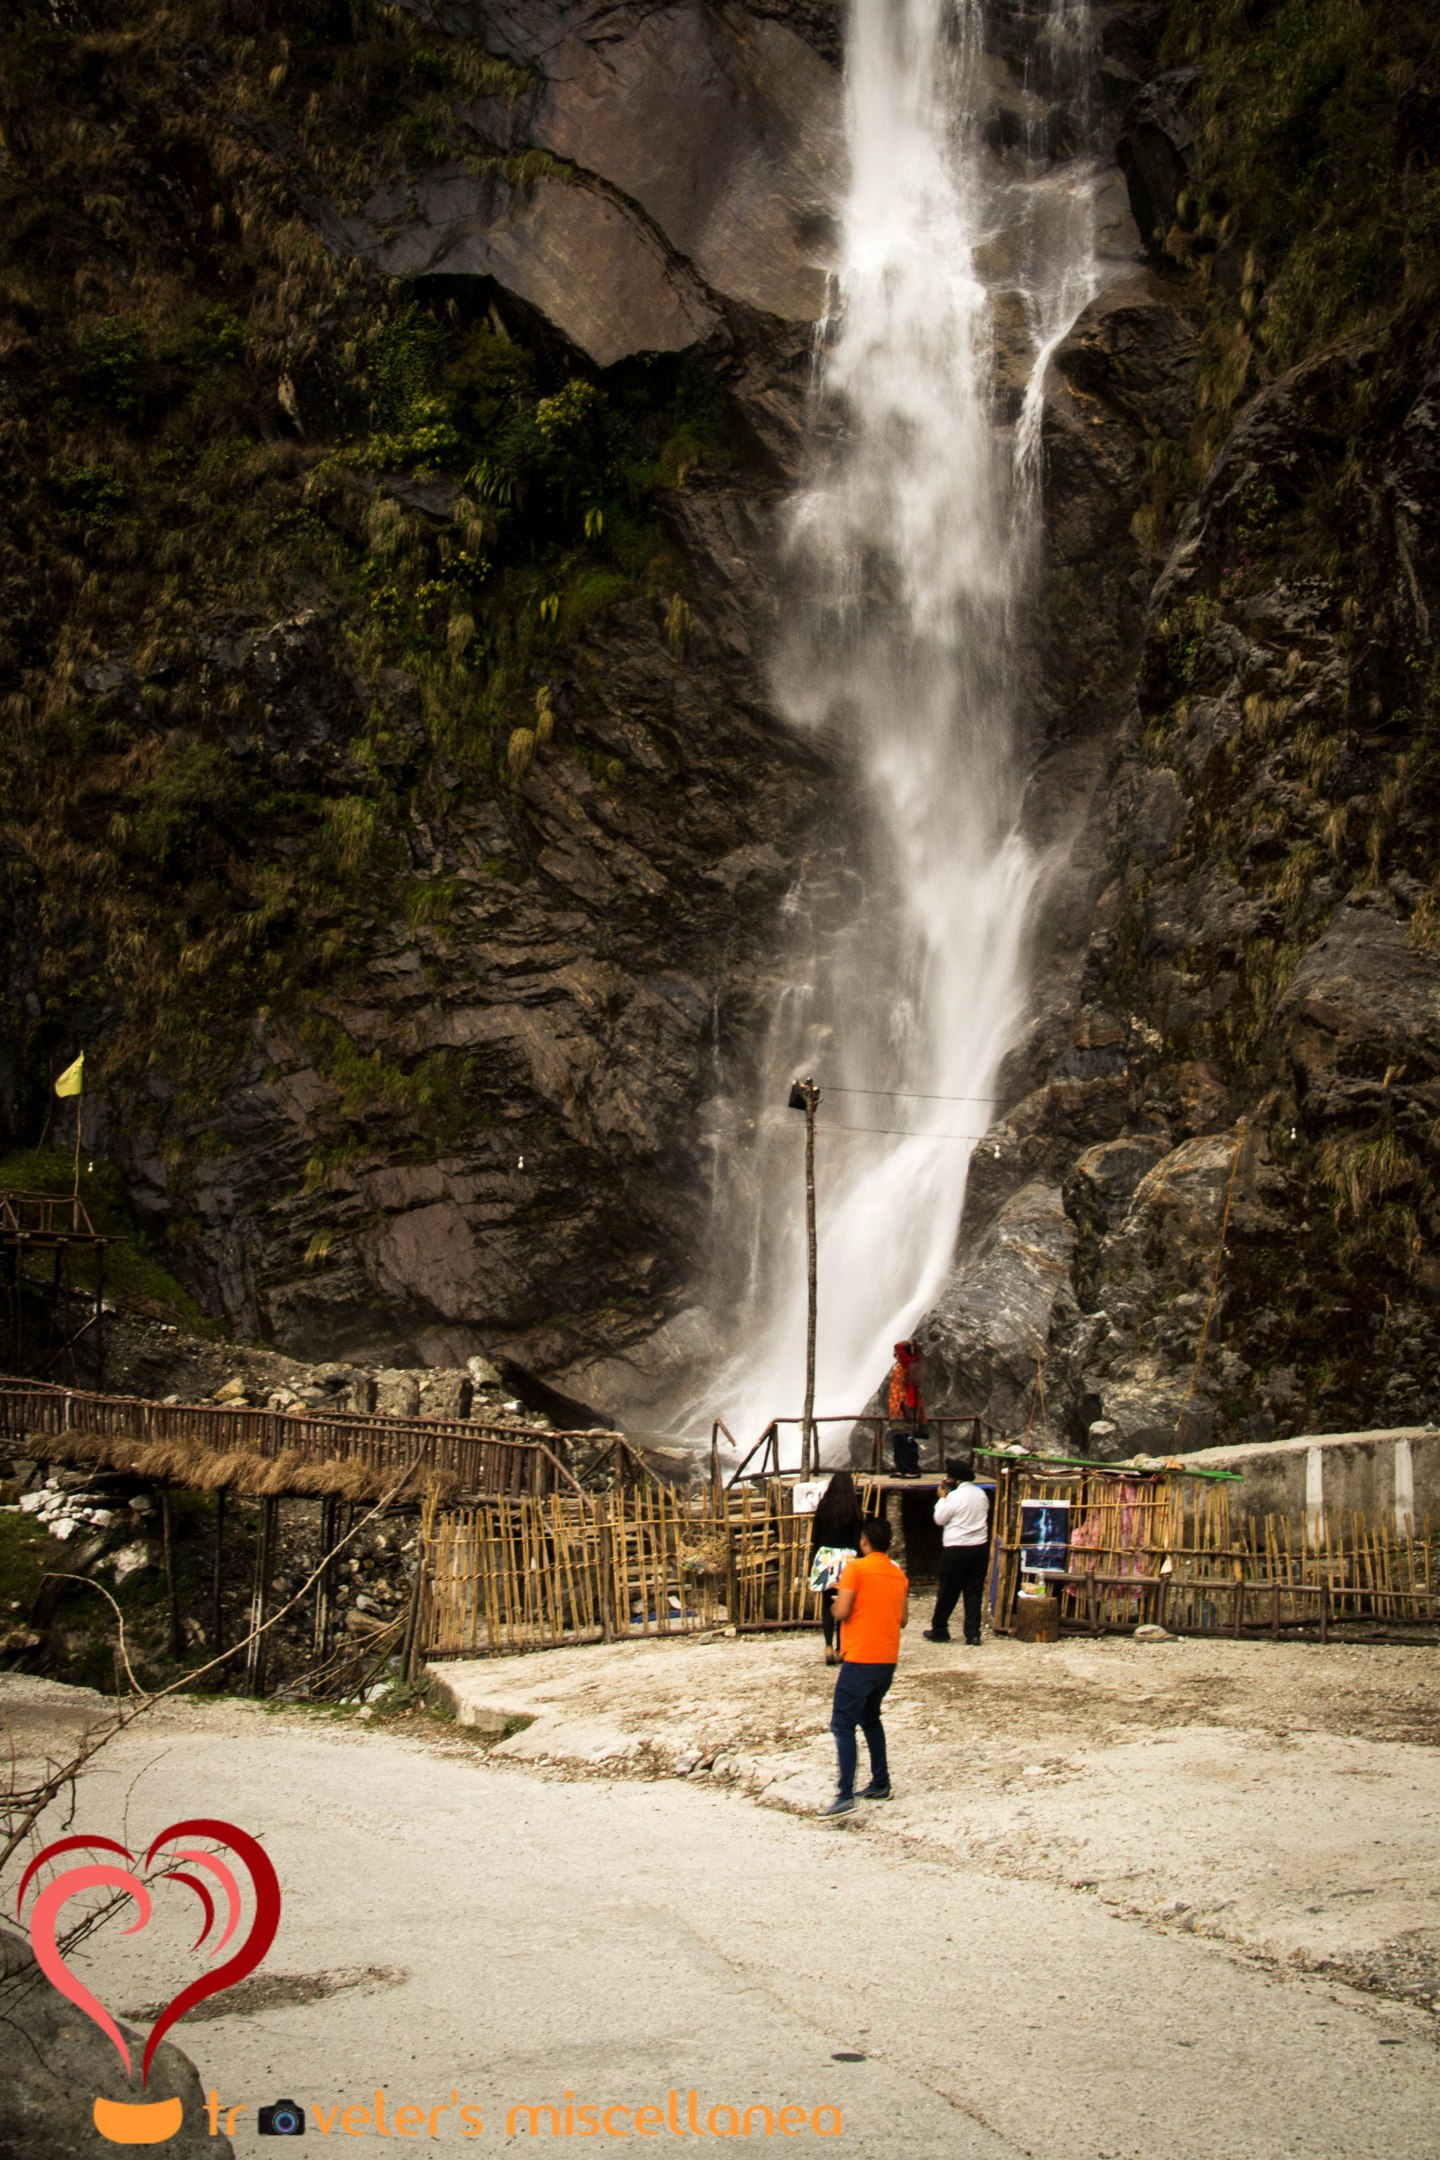 Bhim Nala Waterfalls